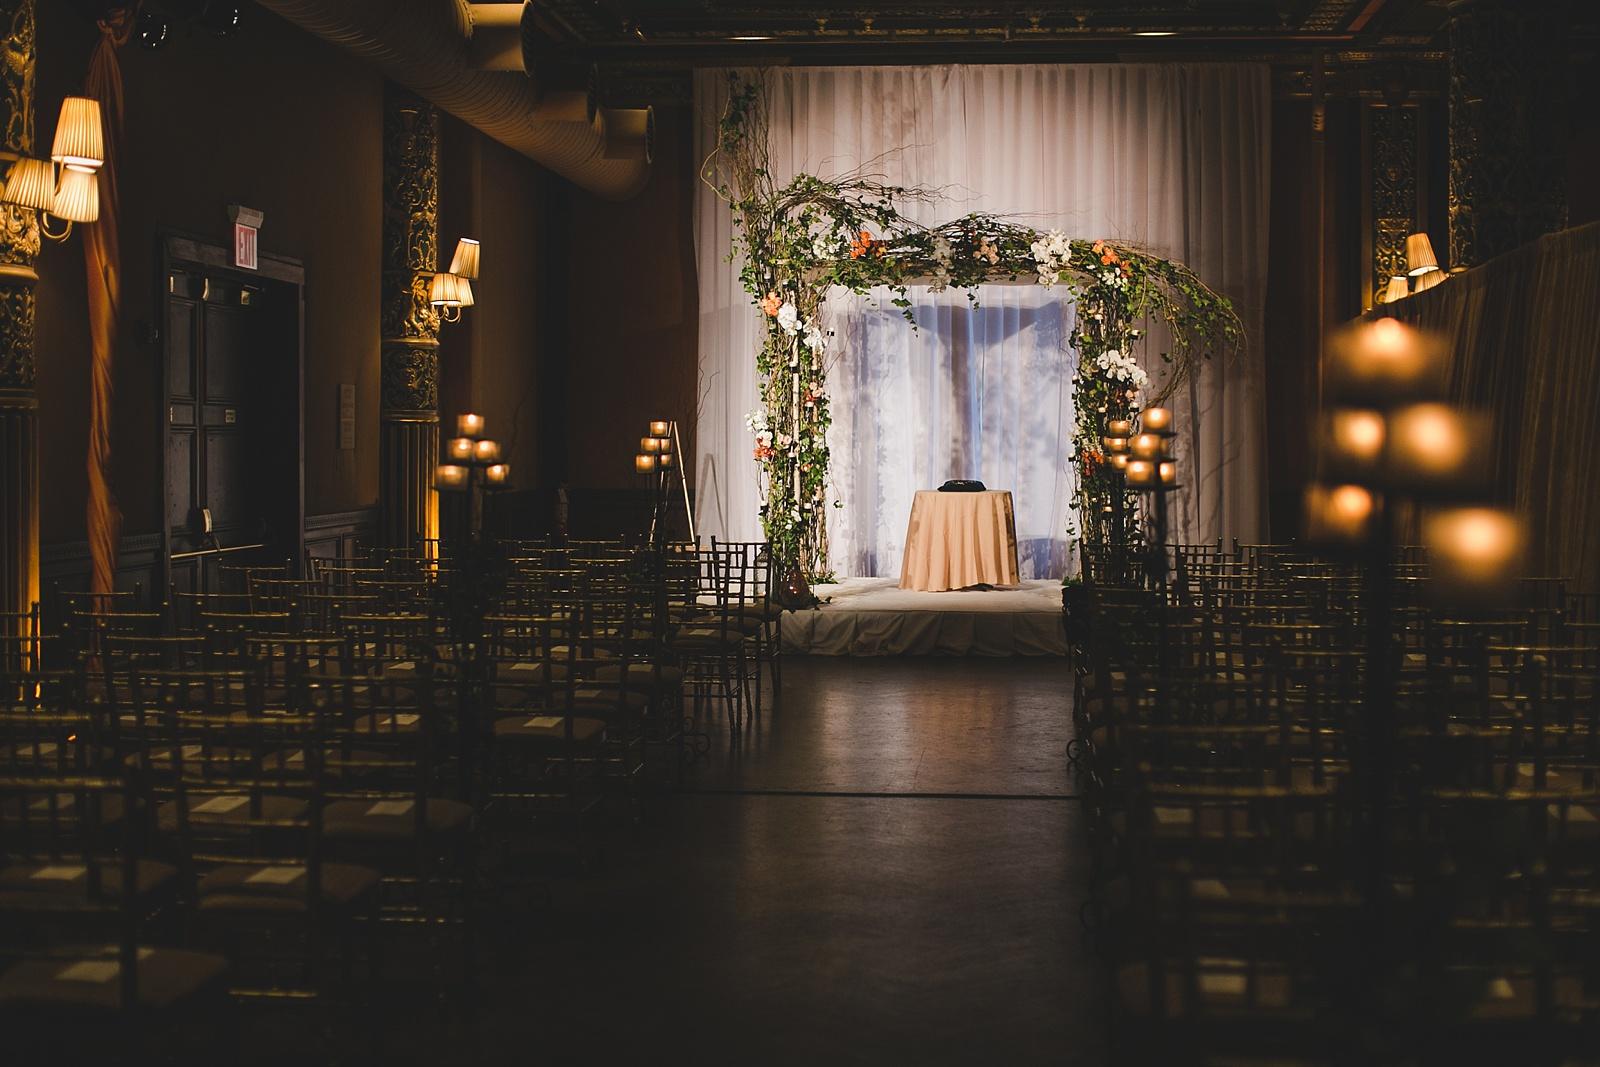 Prince_George_Ballroom_Wedding-31.jpg